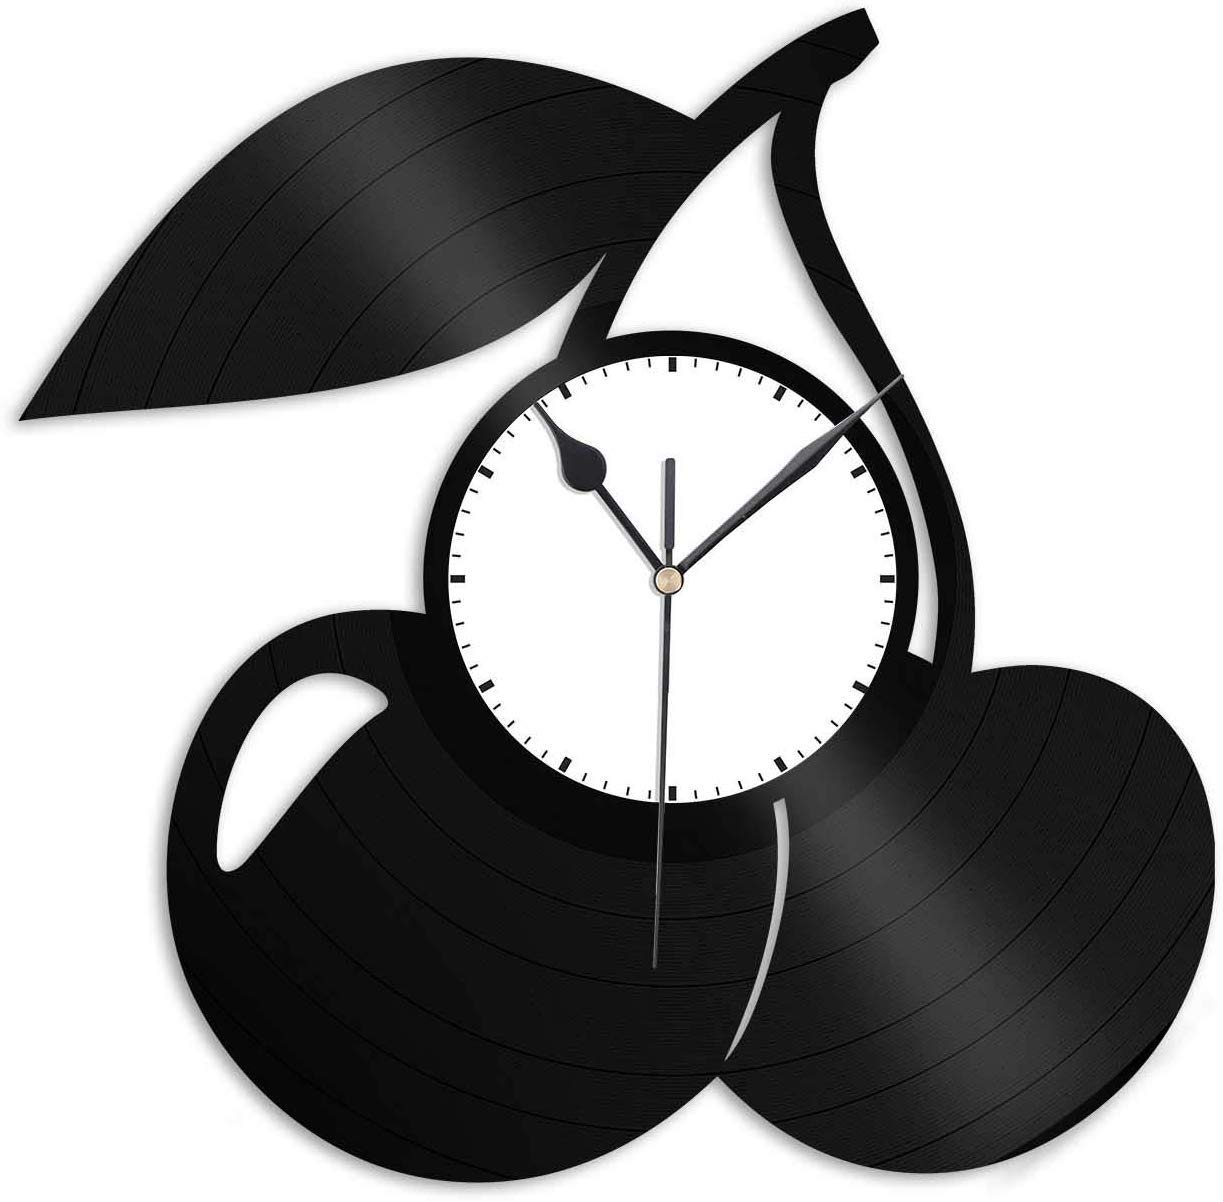 Designer art abstrait SW Designer Horloge murale abstraite moderne horloge murale design Silencieux sans bruit de tic-tac DIXTIME 3D 0413